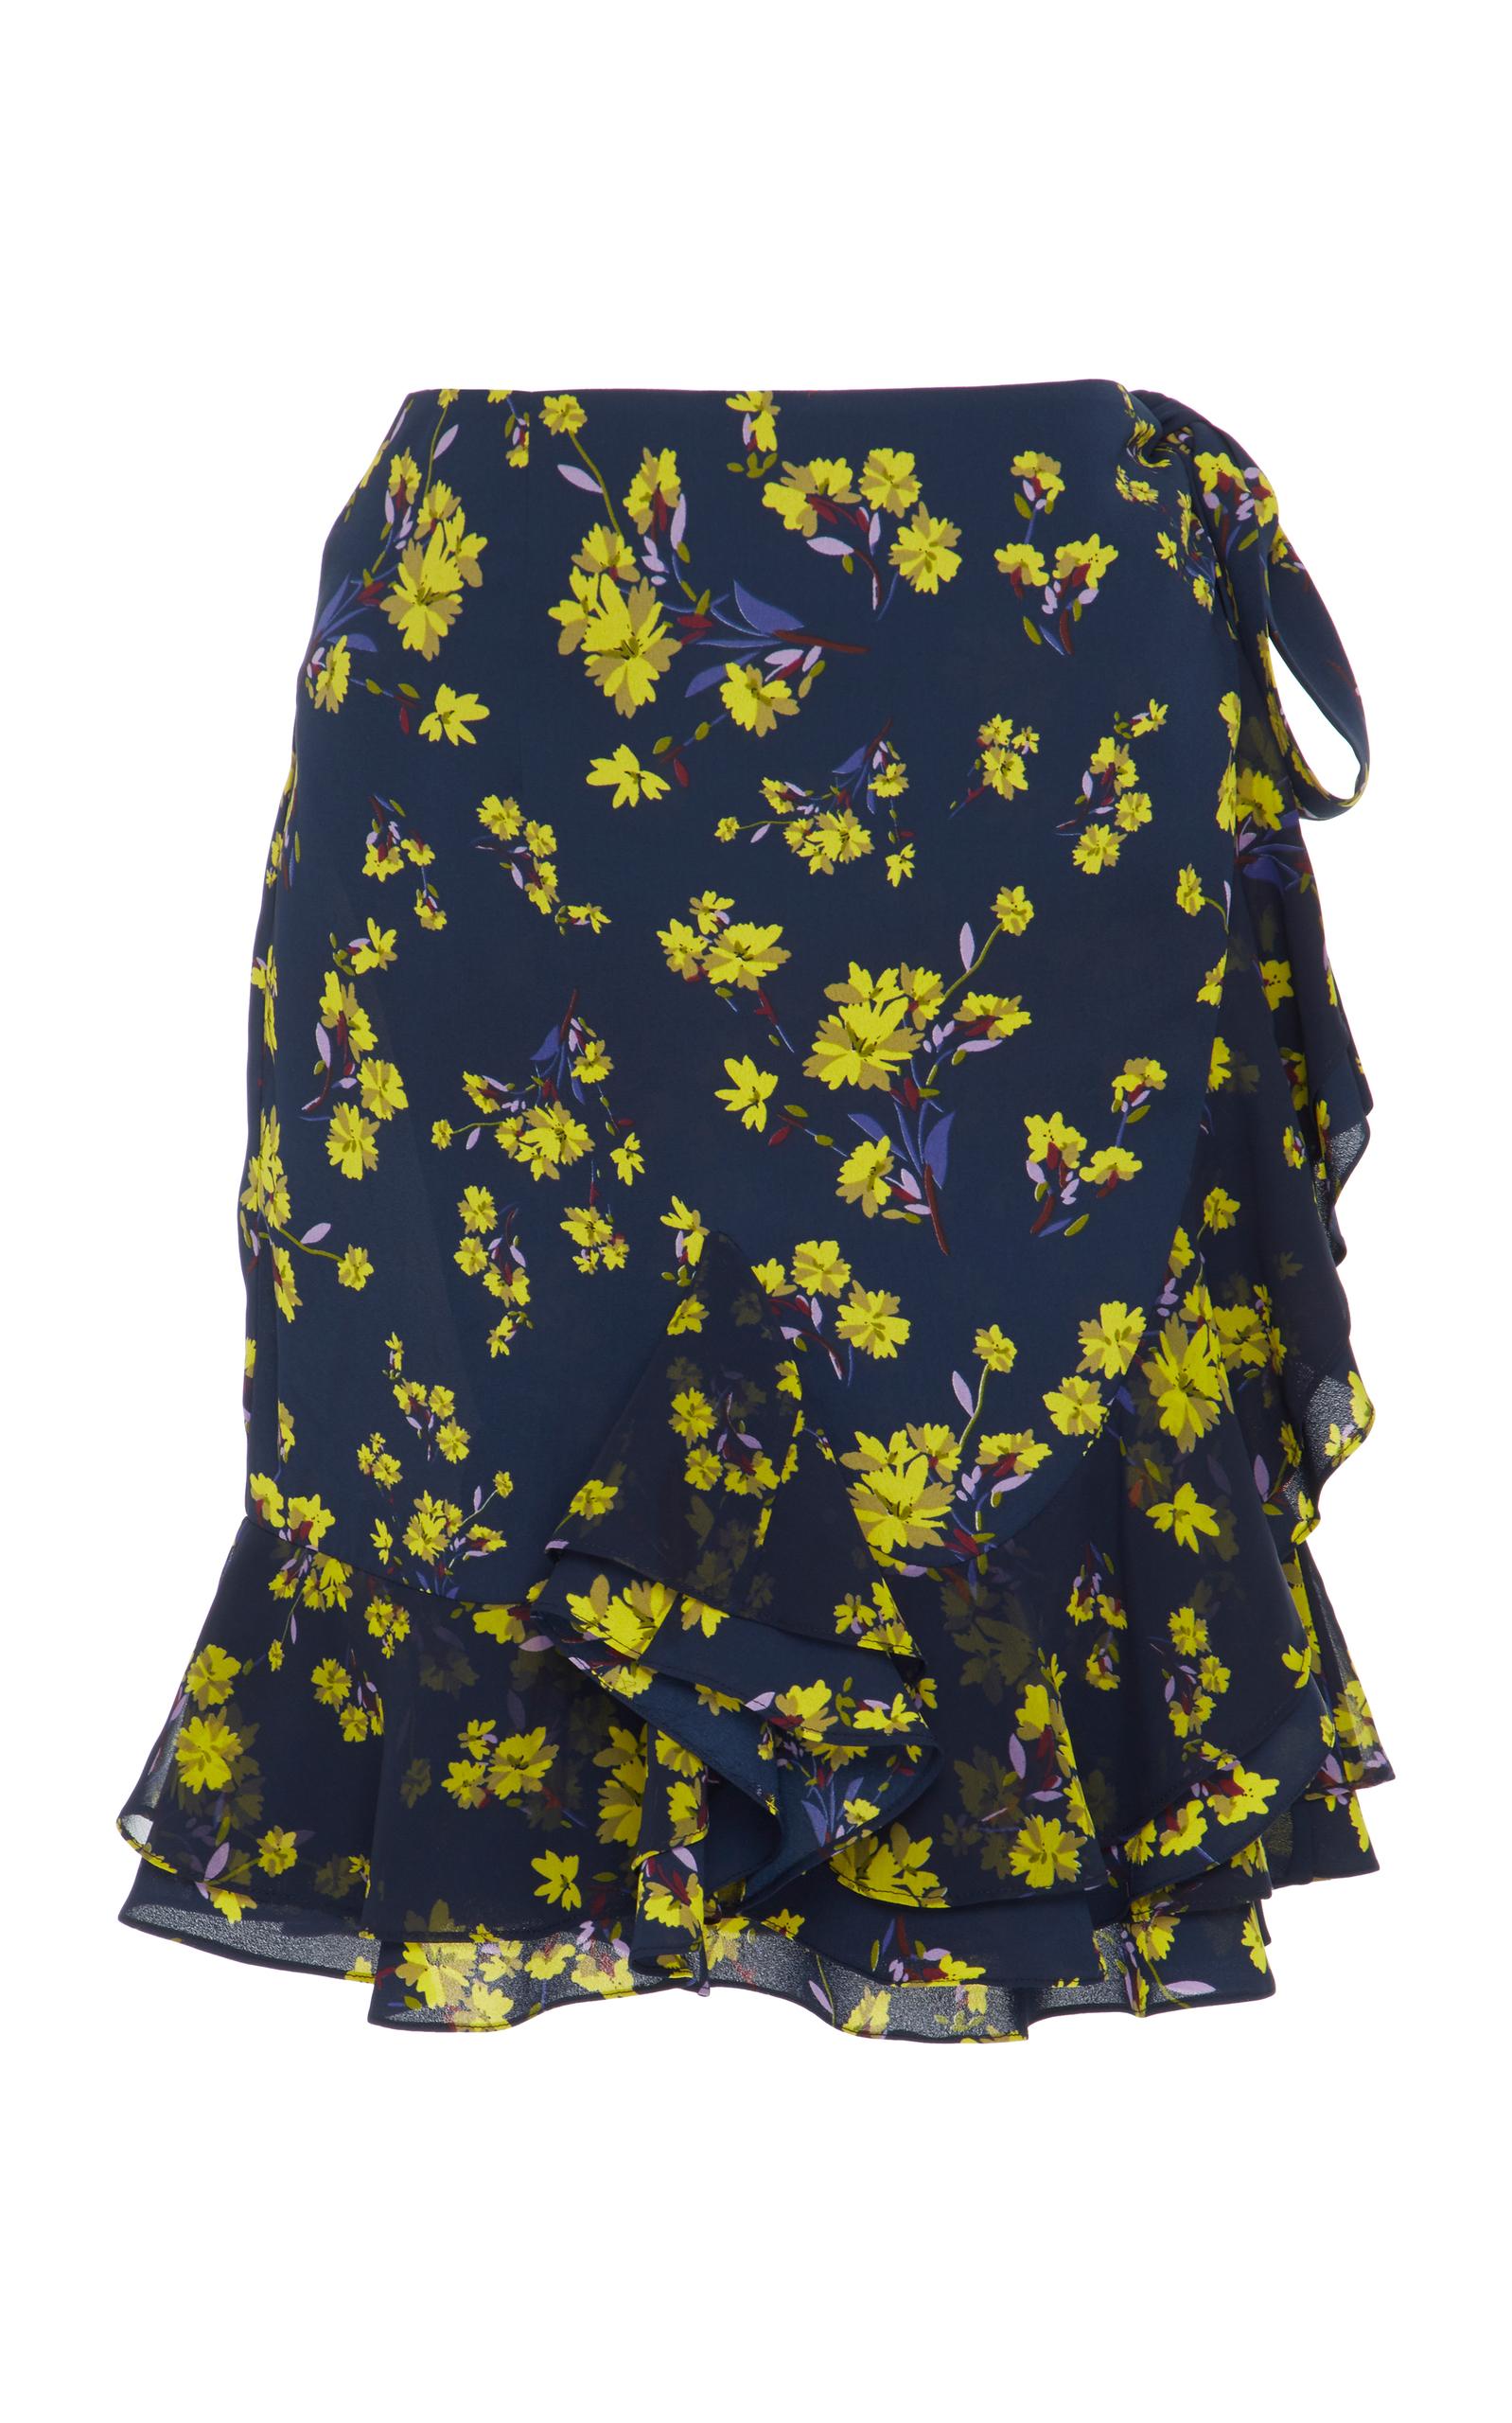 c3c2b5abf8 Floral Printed Ruffled Wrap Mini Skirt by GOEN.J   Moda Operandi